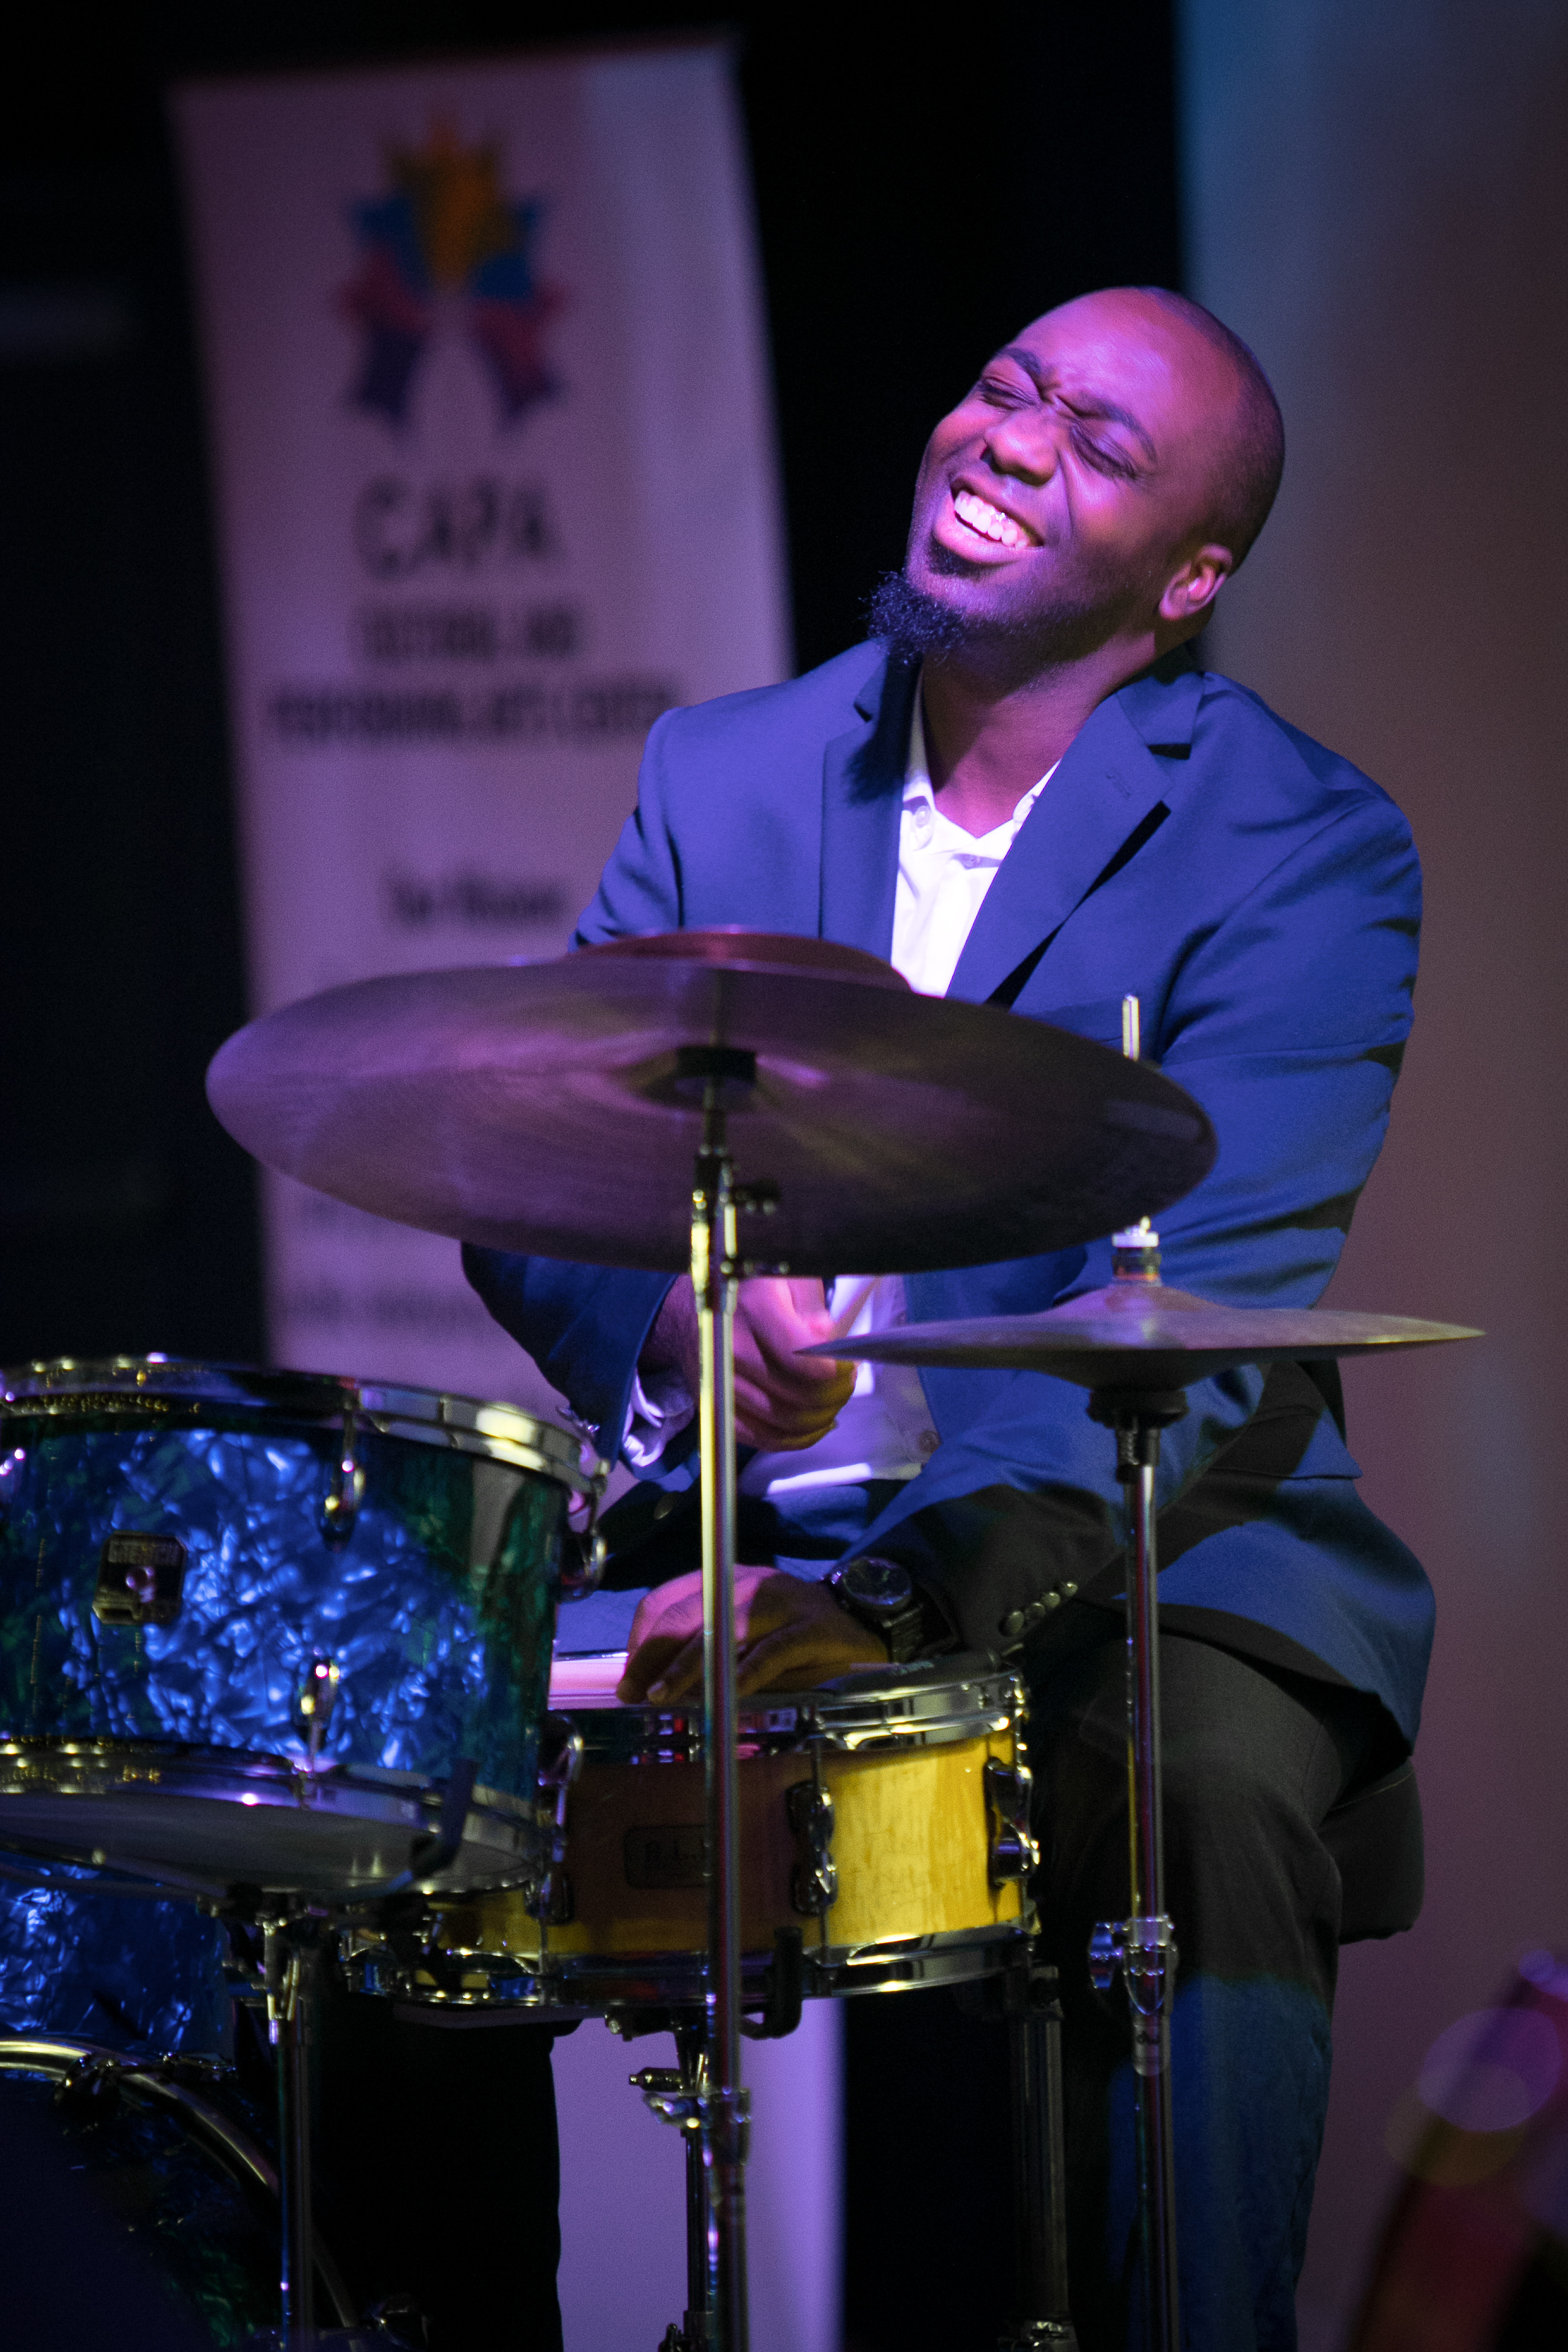 Jazz news: Jumping aboard the hard-bop express